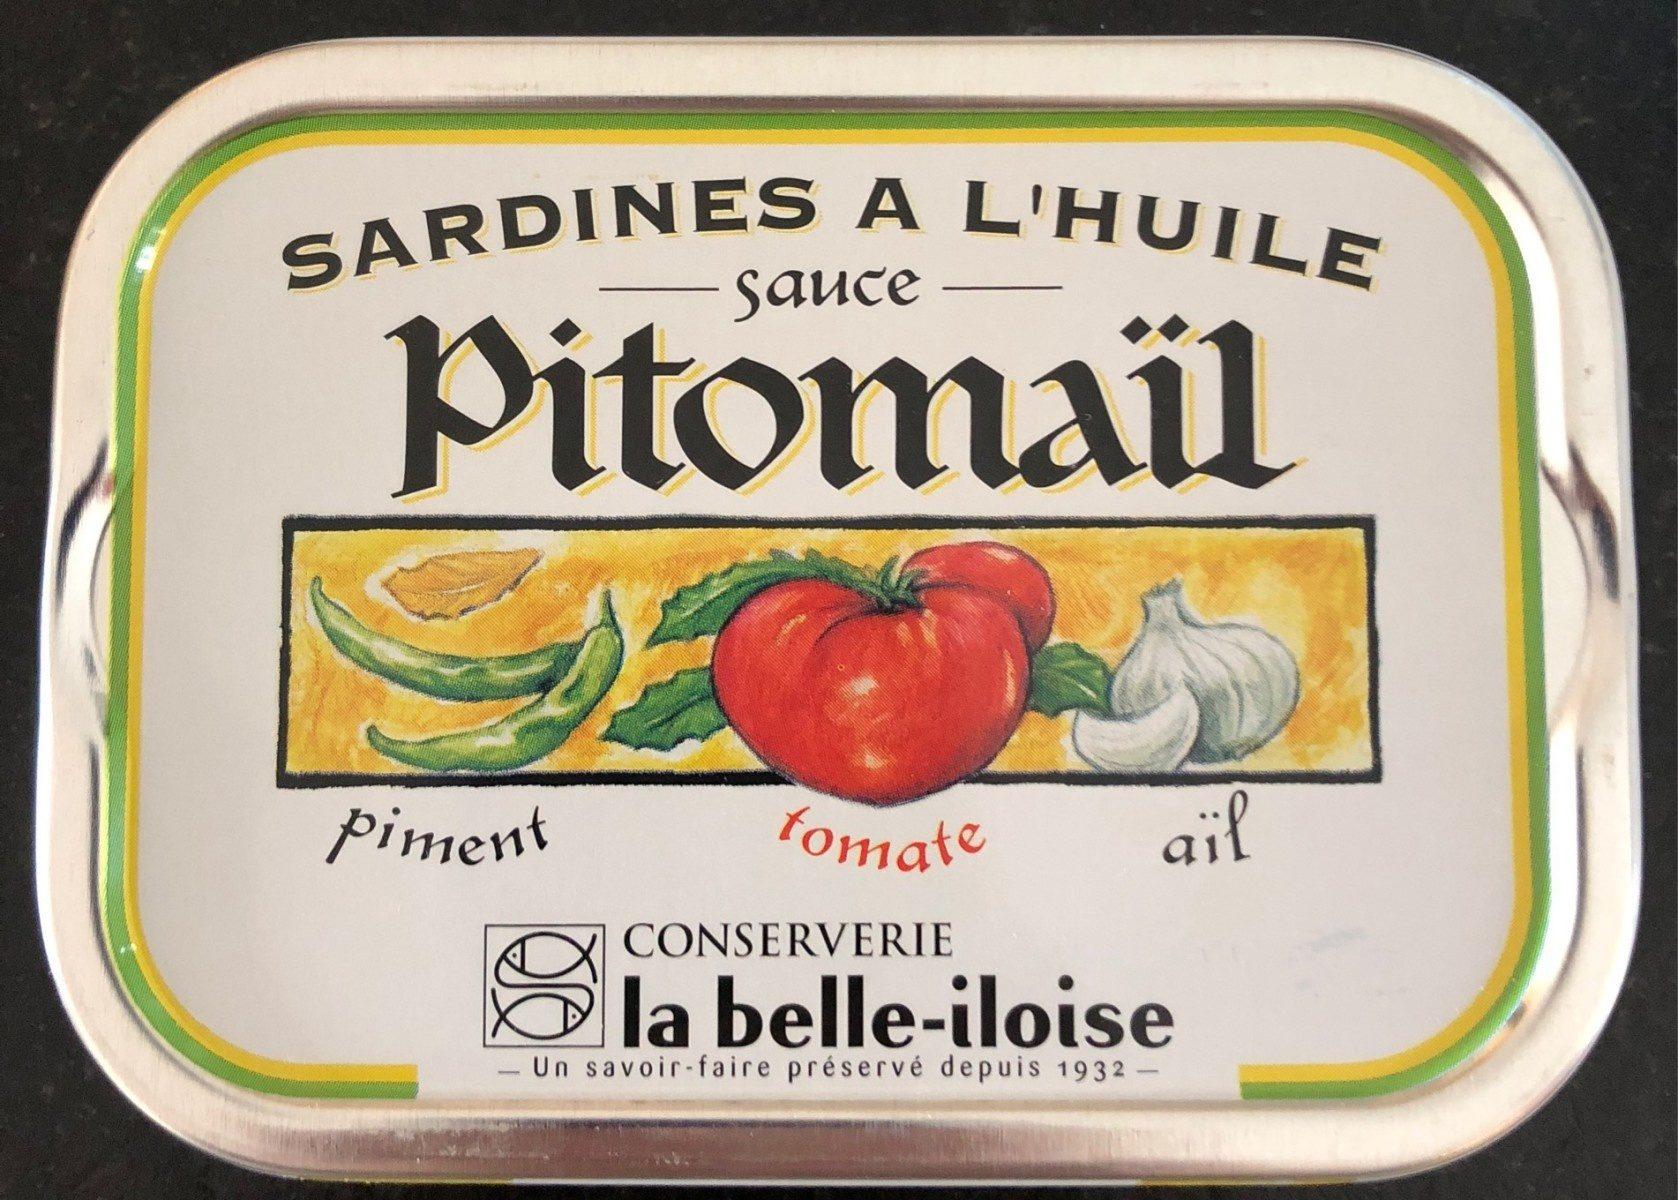 Sardines à l'huile sauce Pitomaïl - Produit